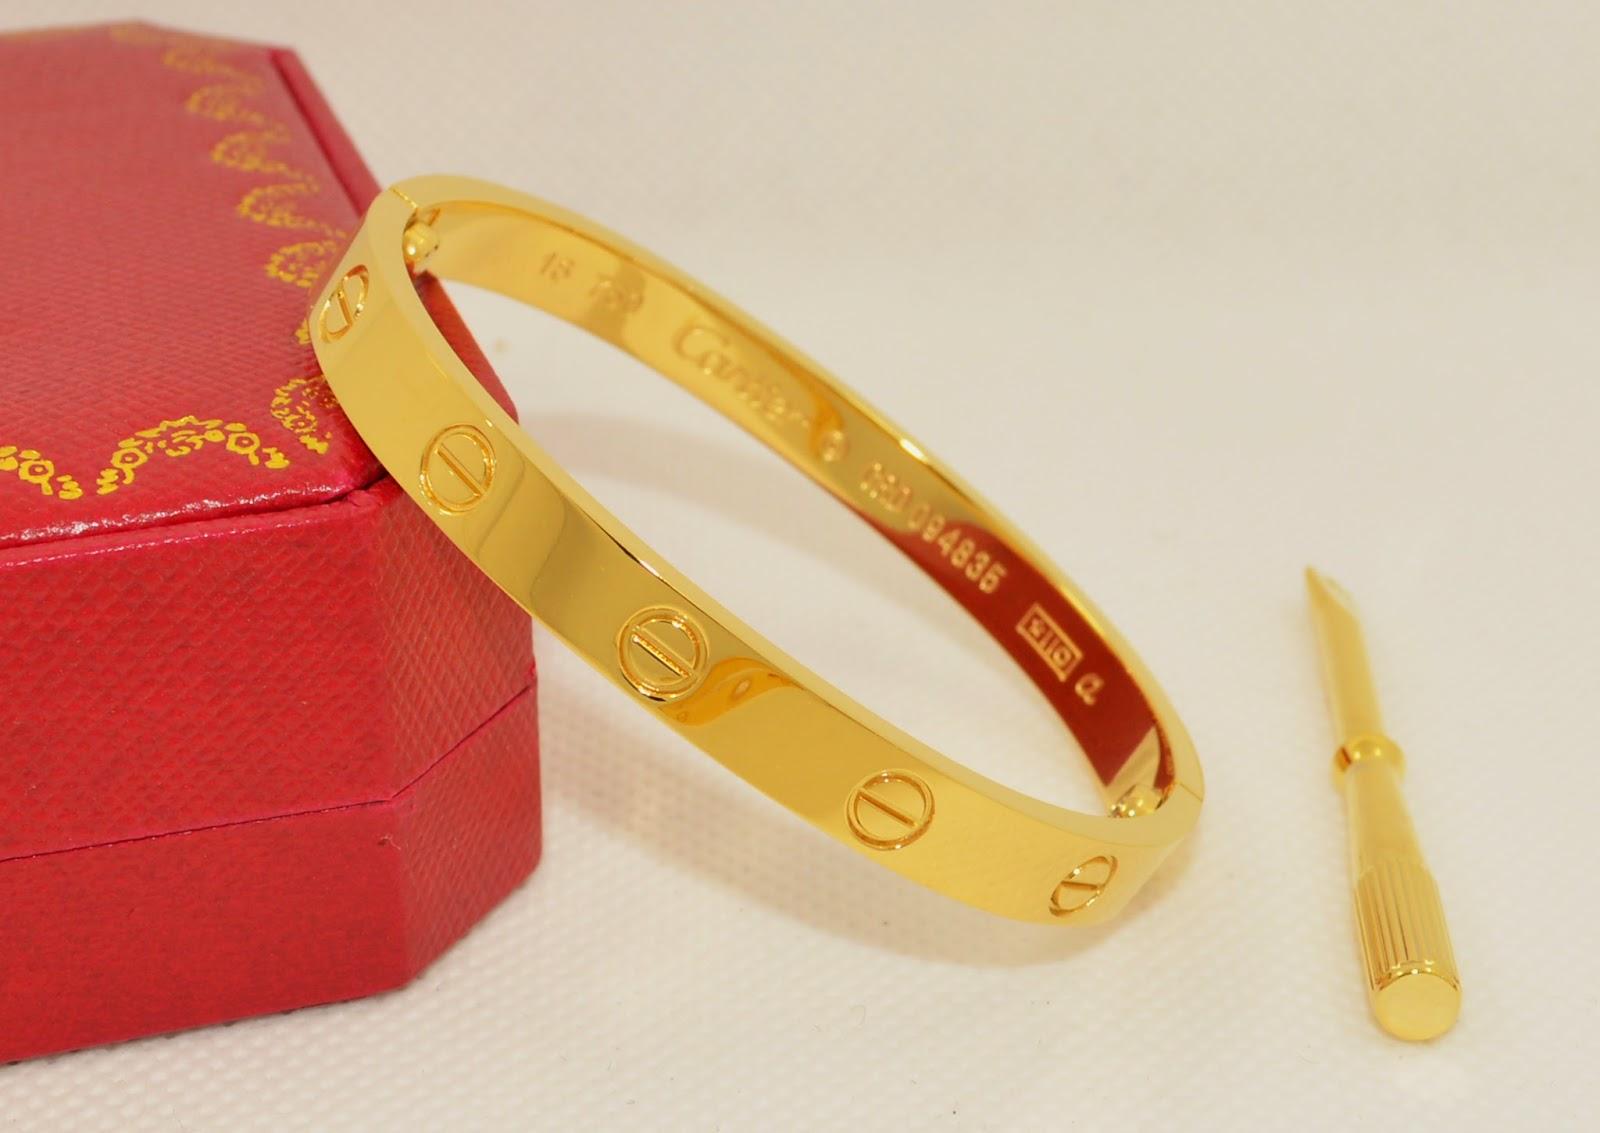 Apple Fashion Top Quality Replica Cartier Love Bracelet